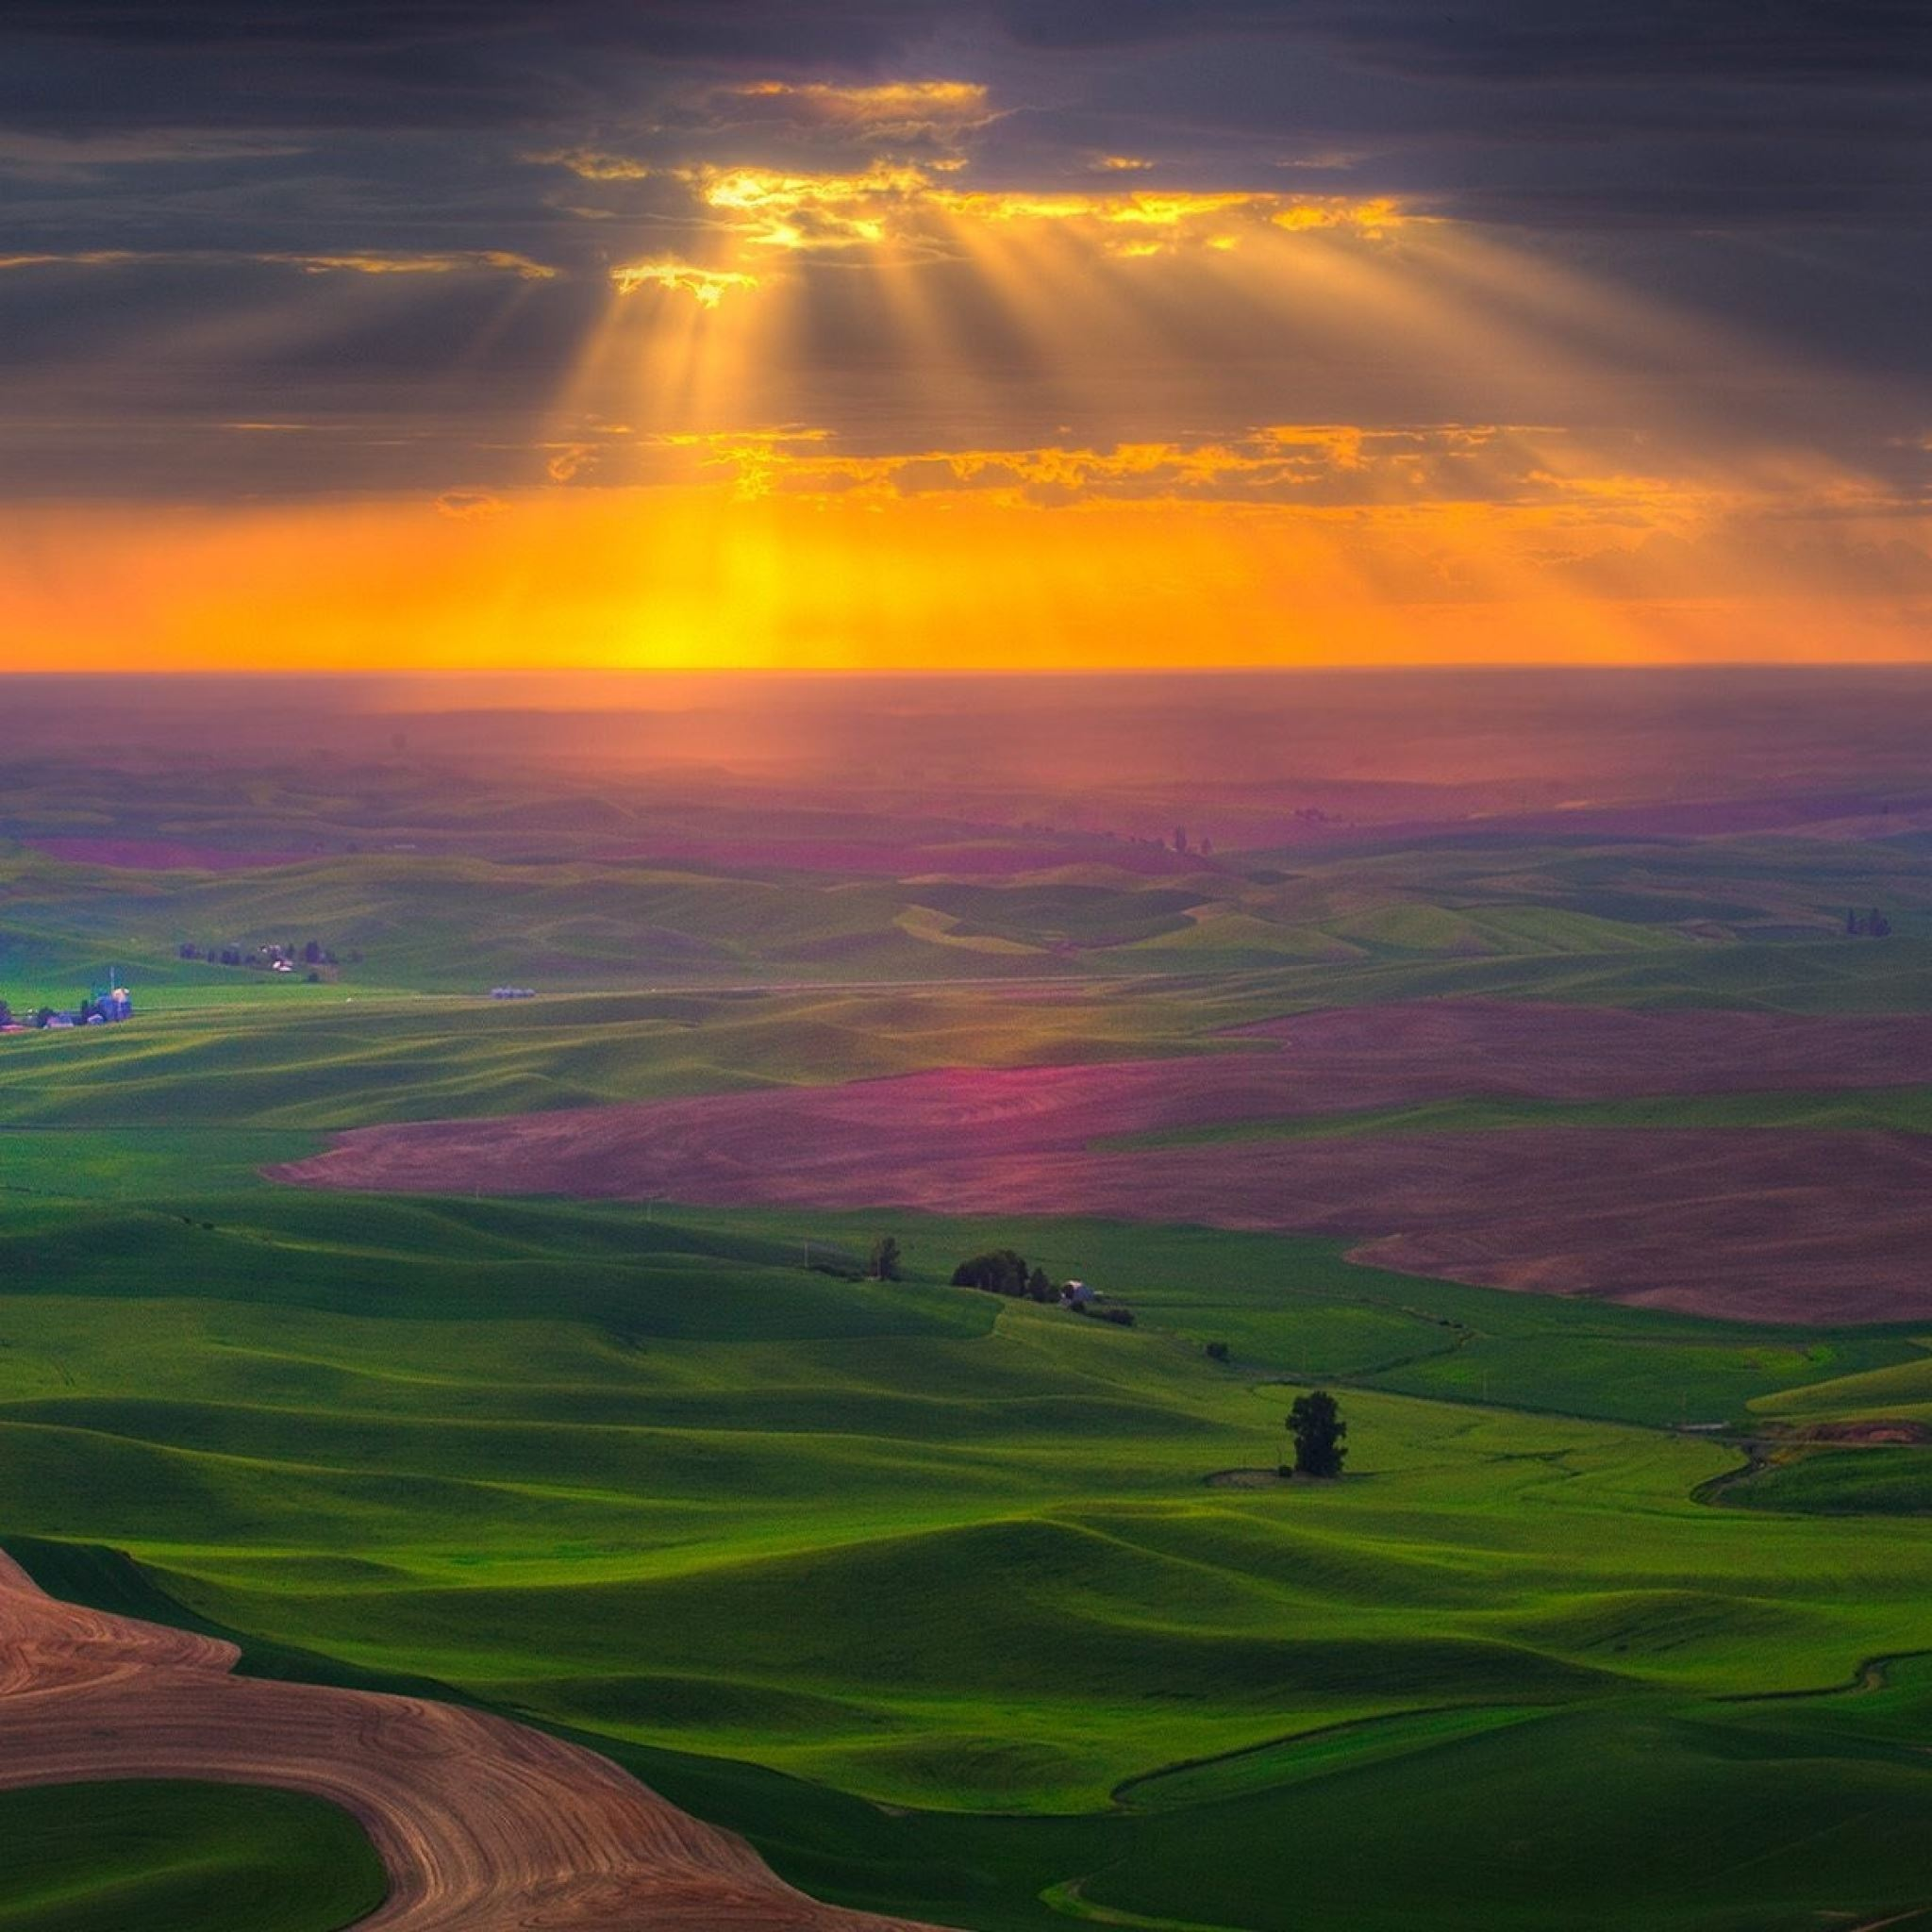 Plain road fields greens sky sun light clouds iPad Air wallpaper